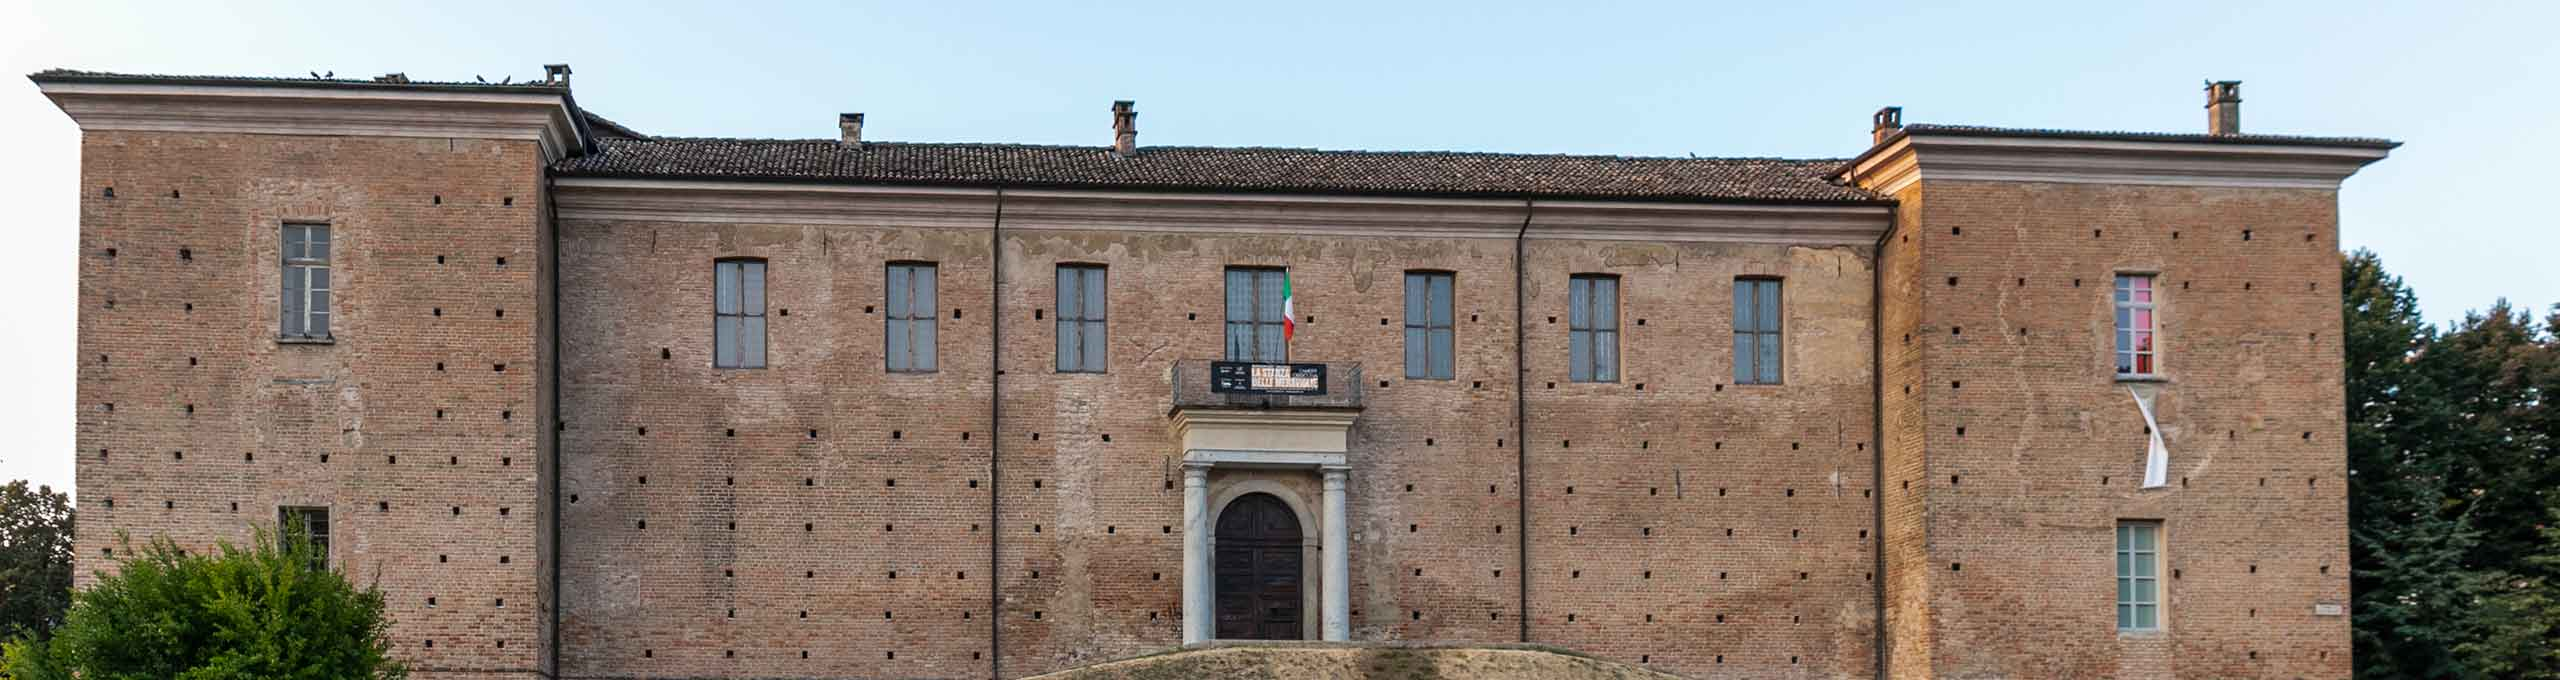 Voghera, Oltrepò Pavese, Castello Visconteo